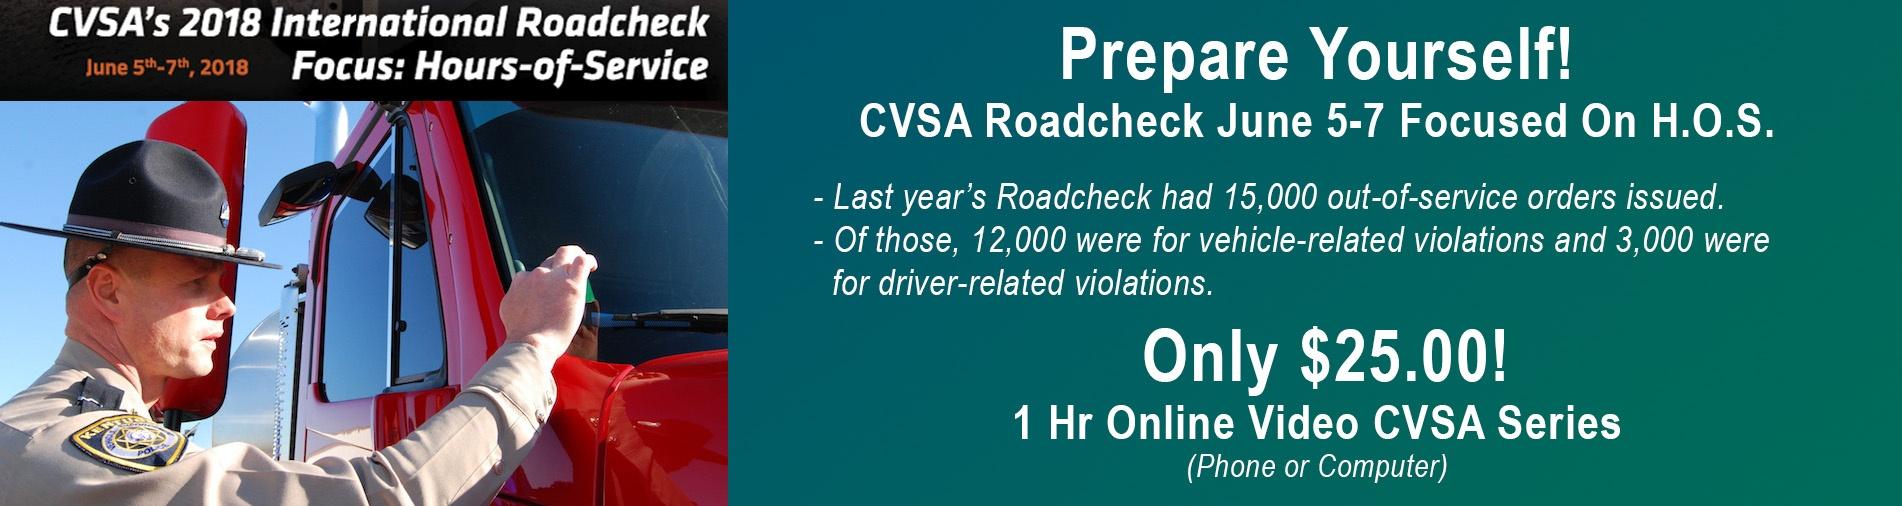 CVSA Roadcheck gs banner-1